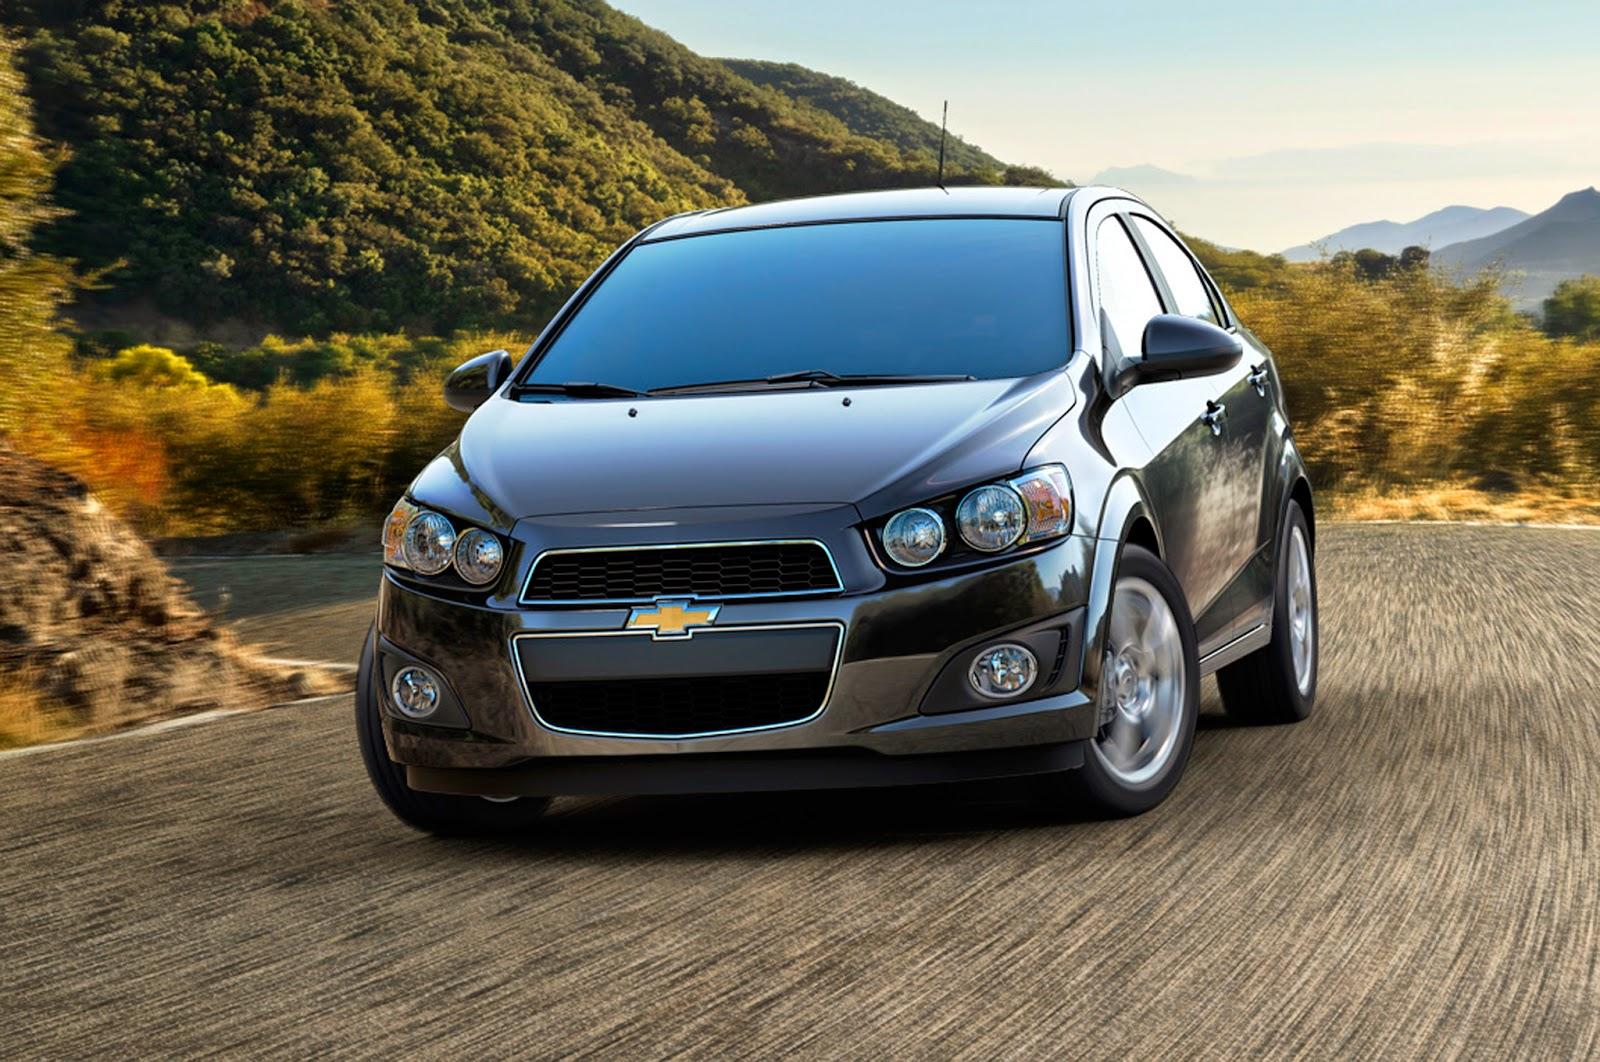 Kekurangan Chevrolet Aveo 2014 Harga